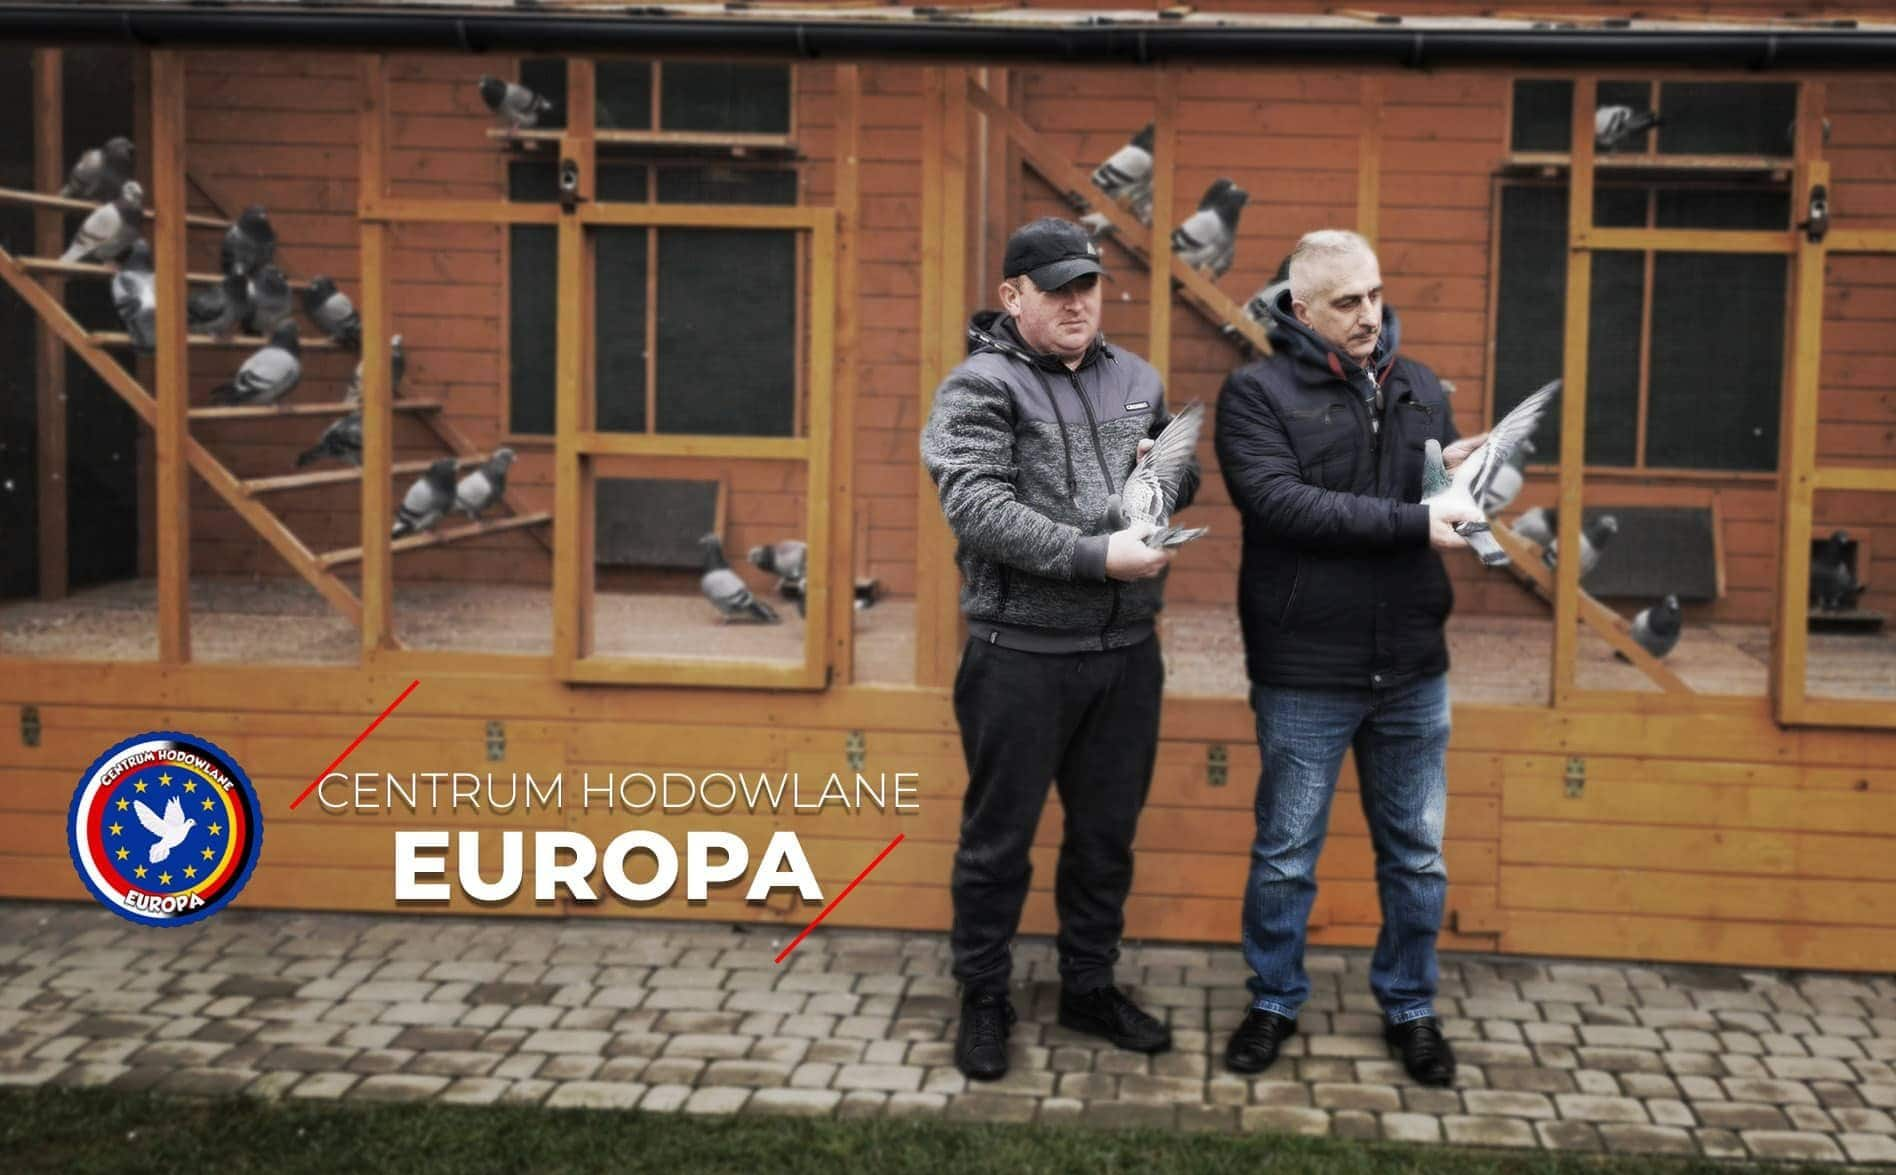 Centrum Hodowlane Europa